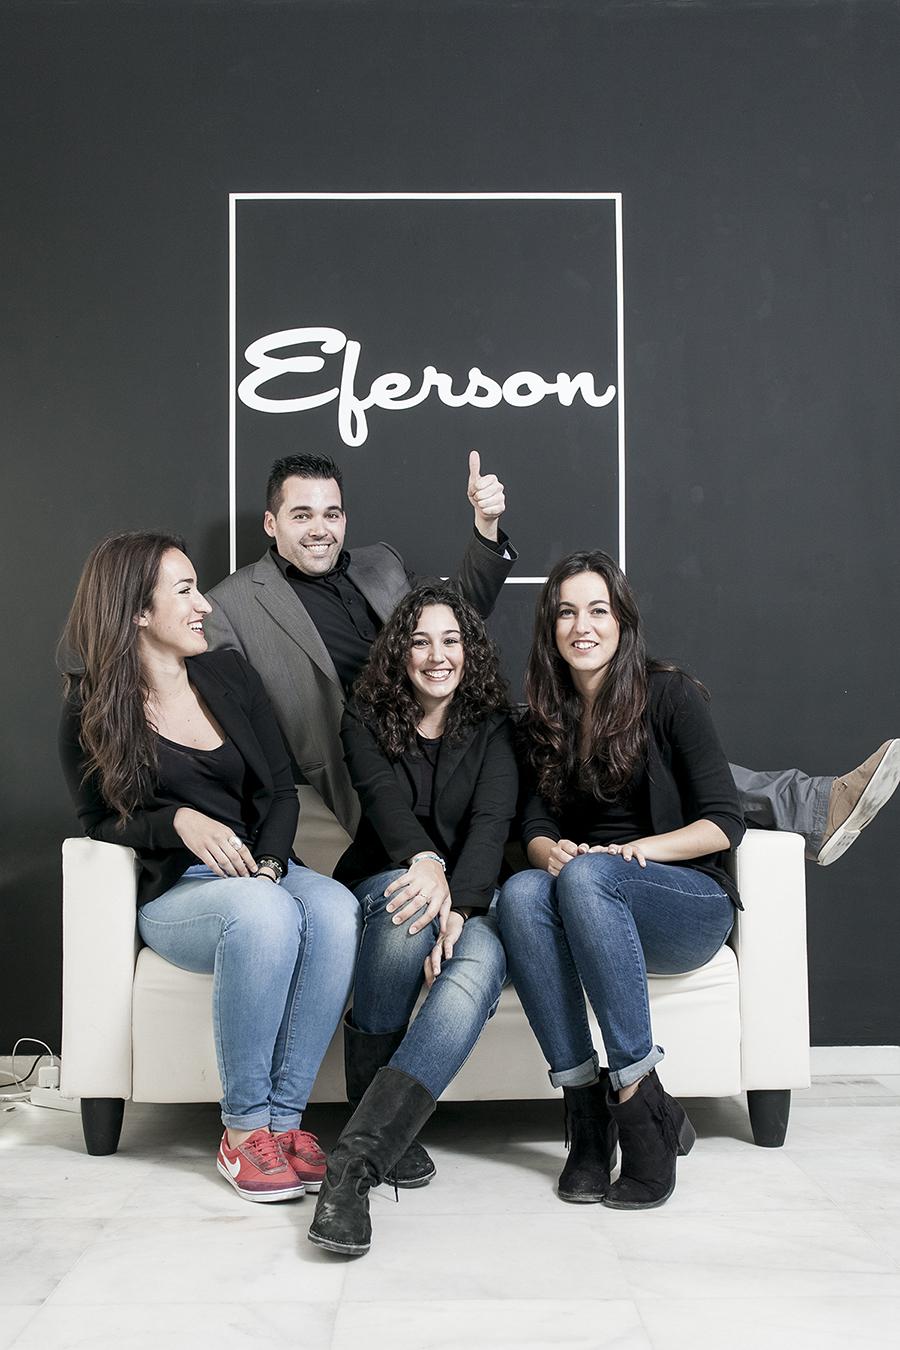 Eferson_900_1